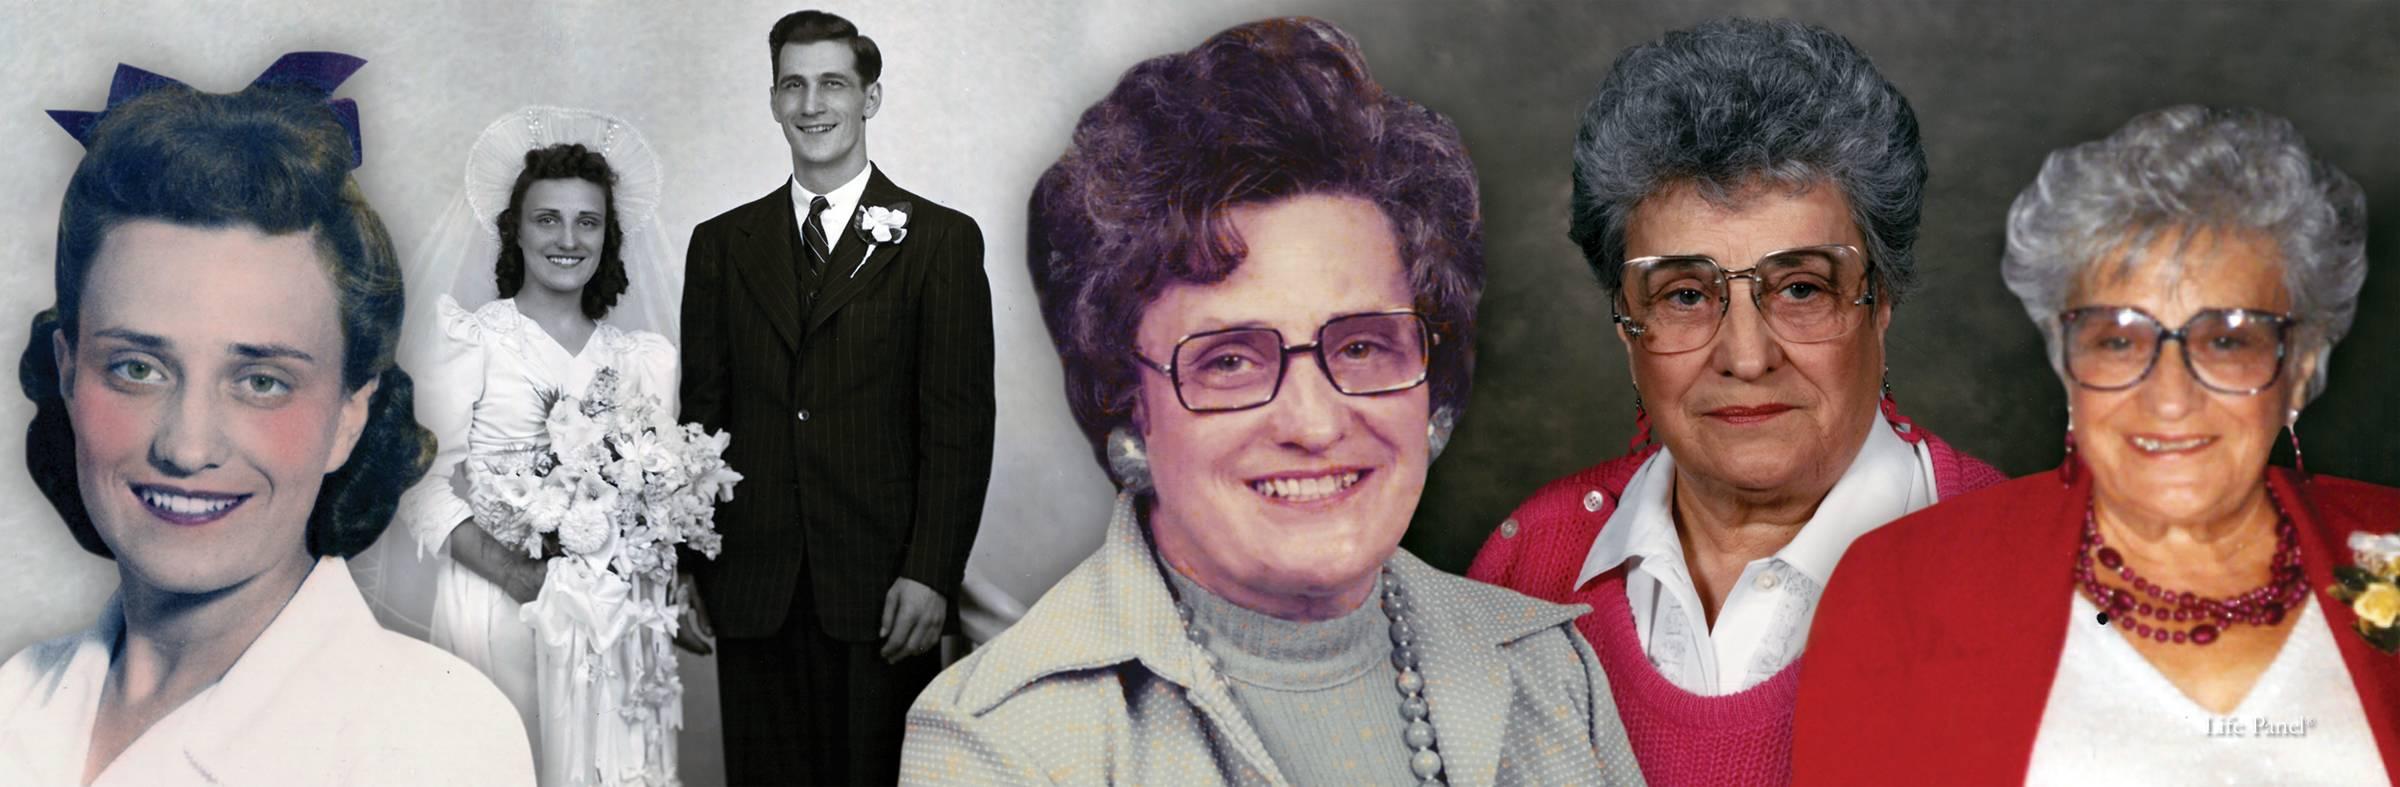 Margaret Orban : May 29, 1919 - May 21, 2016   Racine, WI